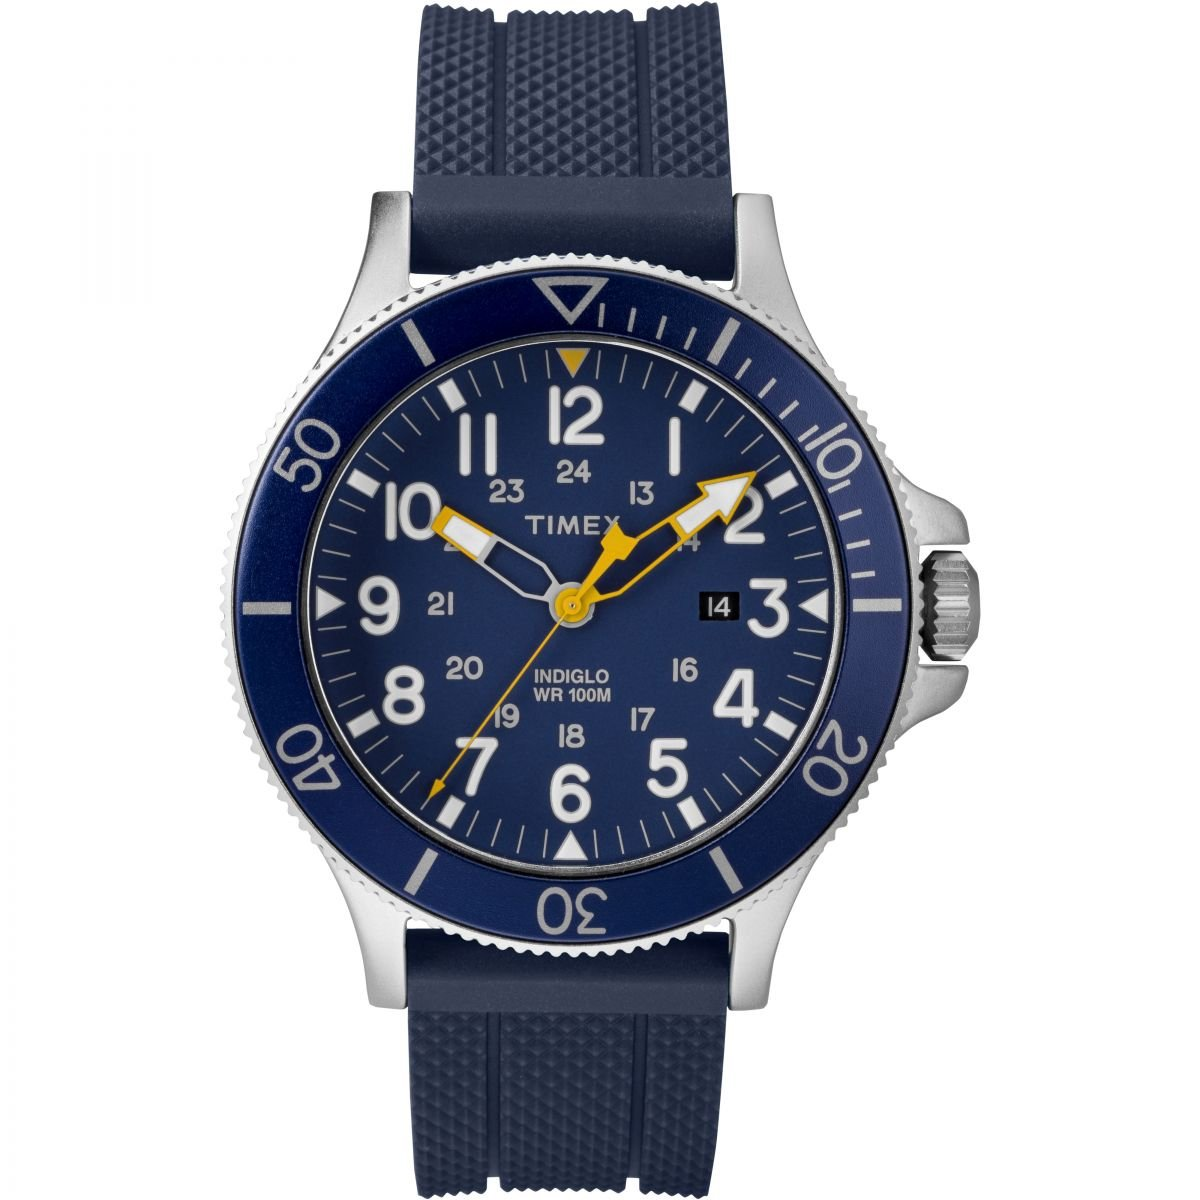 Timex Allied Watch TW2R60700